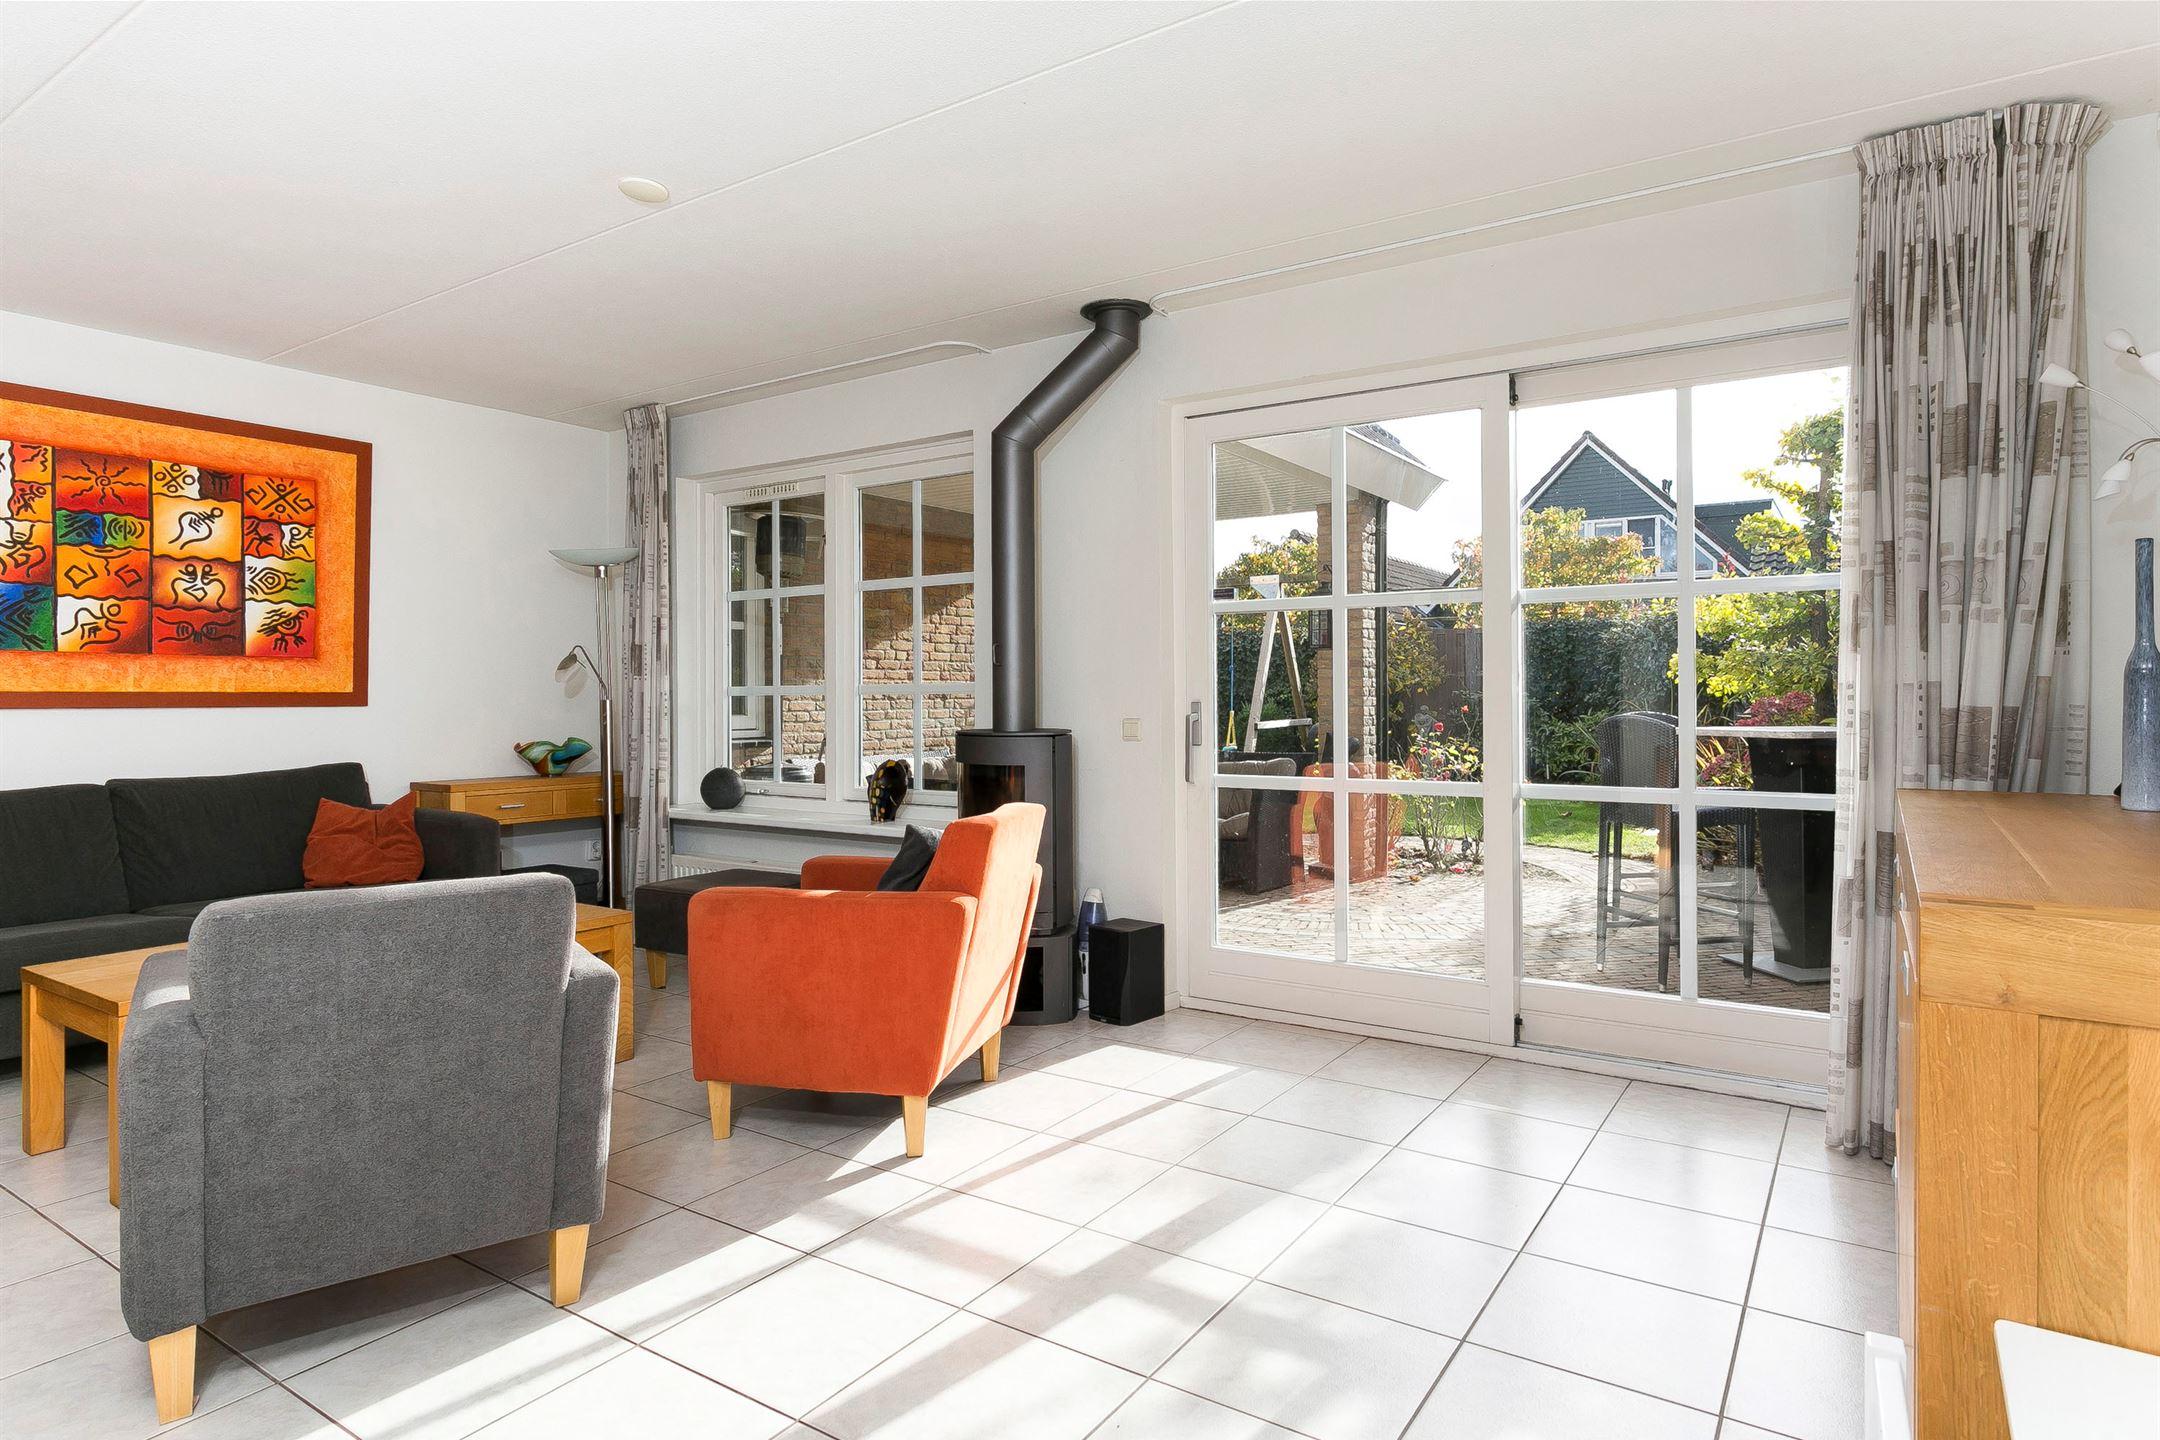 Huis te koop: Aletta Jacobshoeve 11 7207 GC Zutphen [funda]